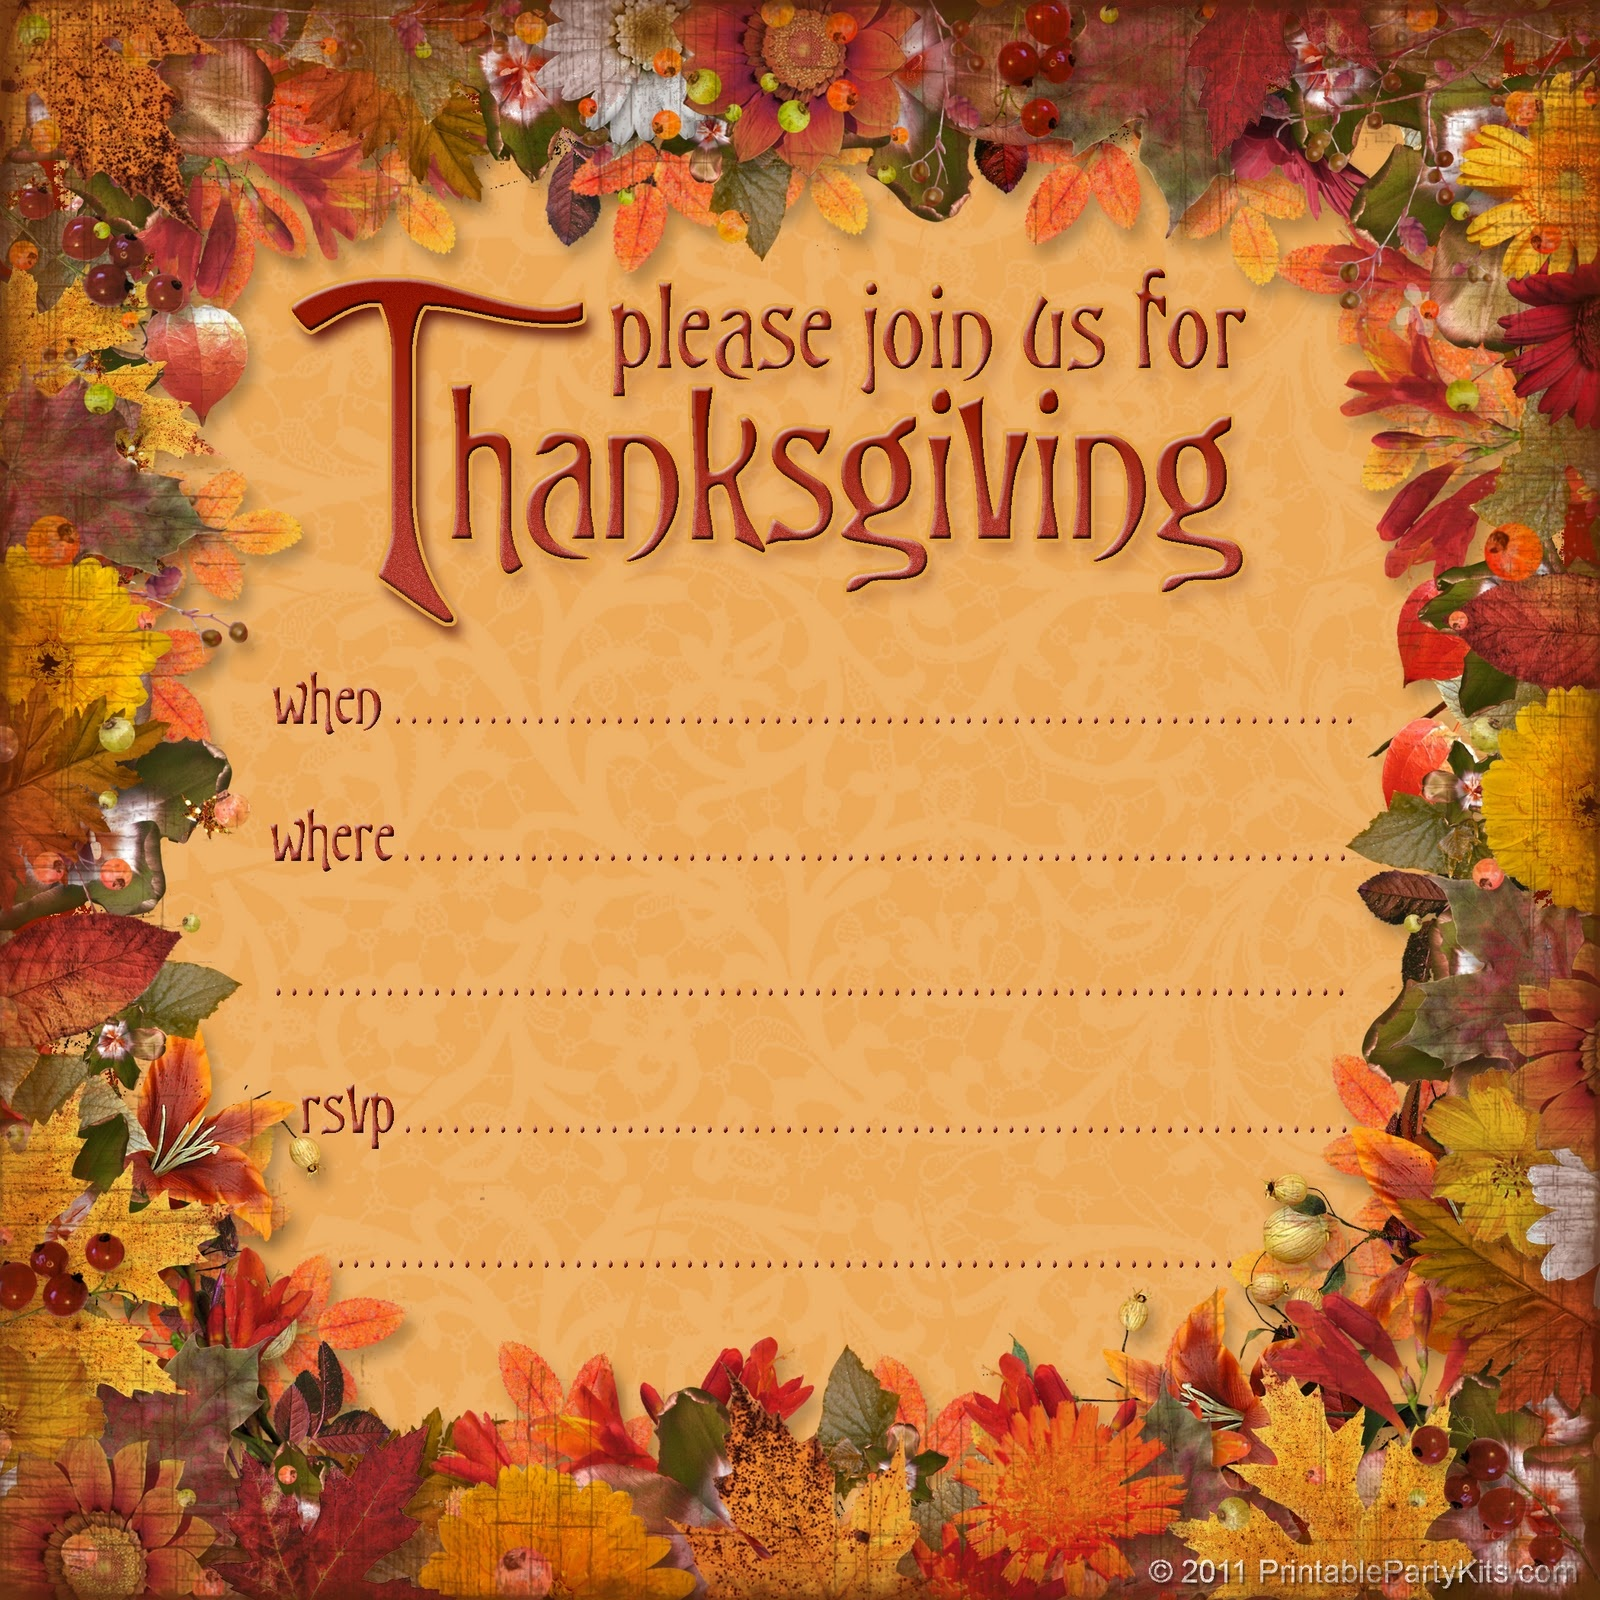 Free Thanksgiving Invitations Templates – Happy Easter - Free Printable Thanksgiving Invitation Templates